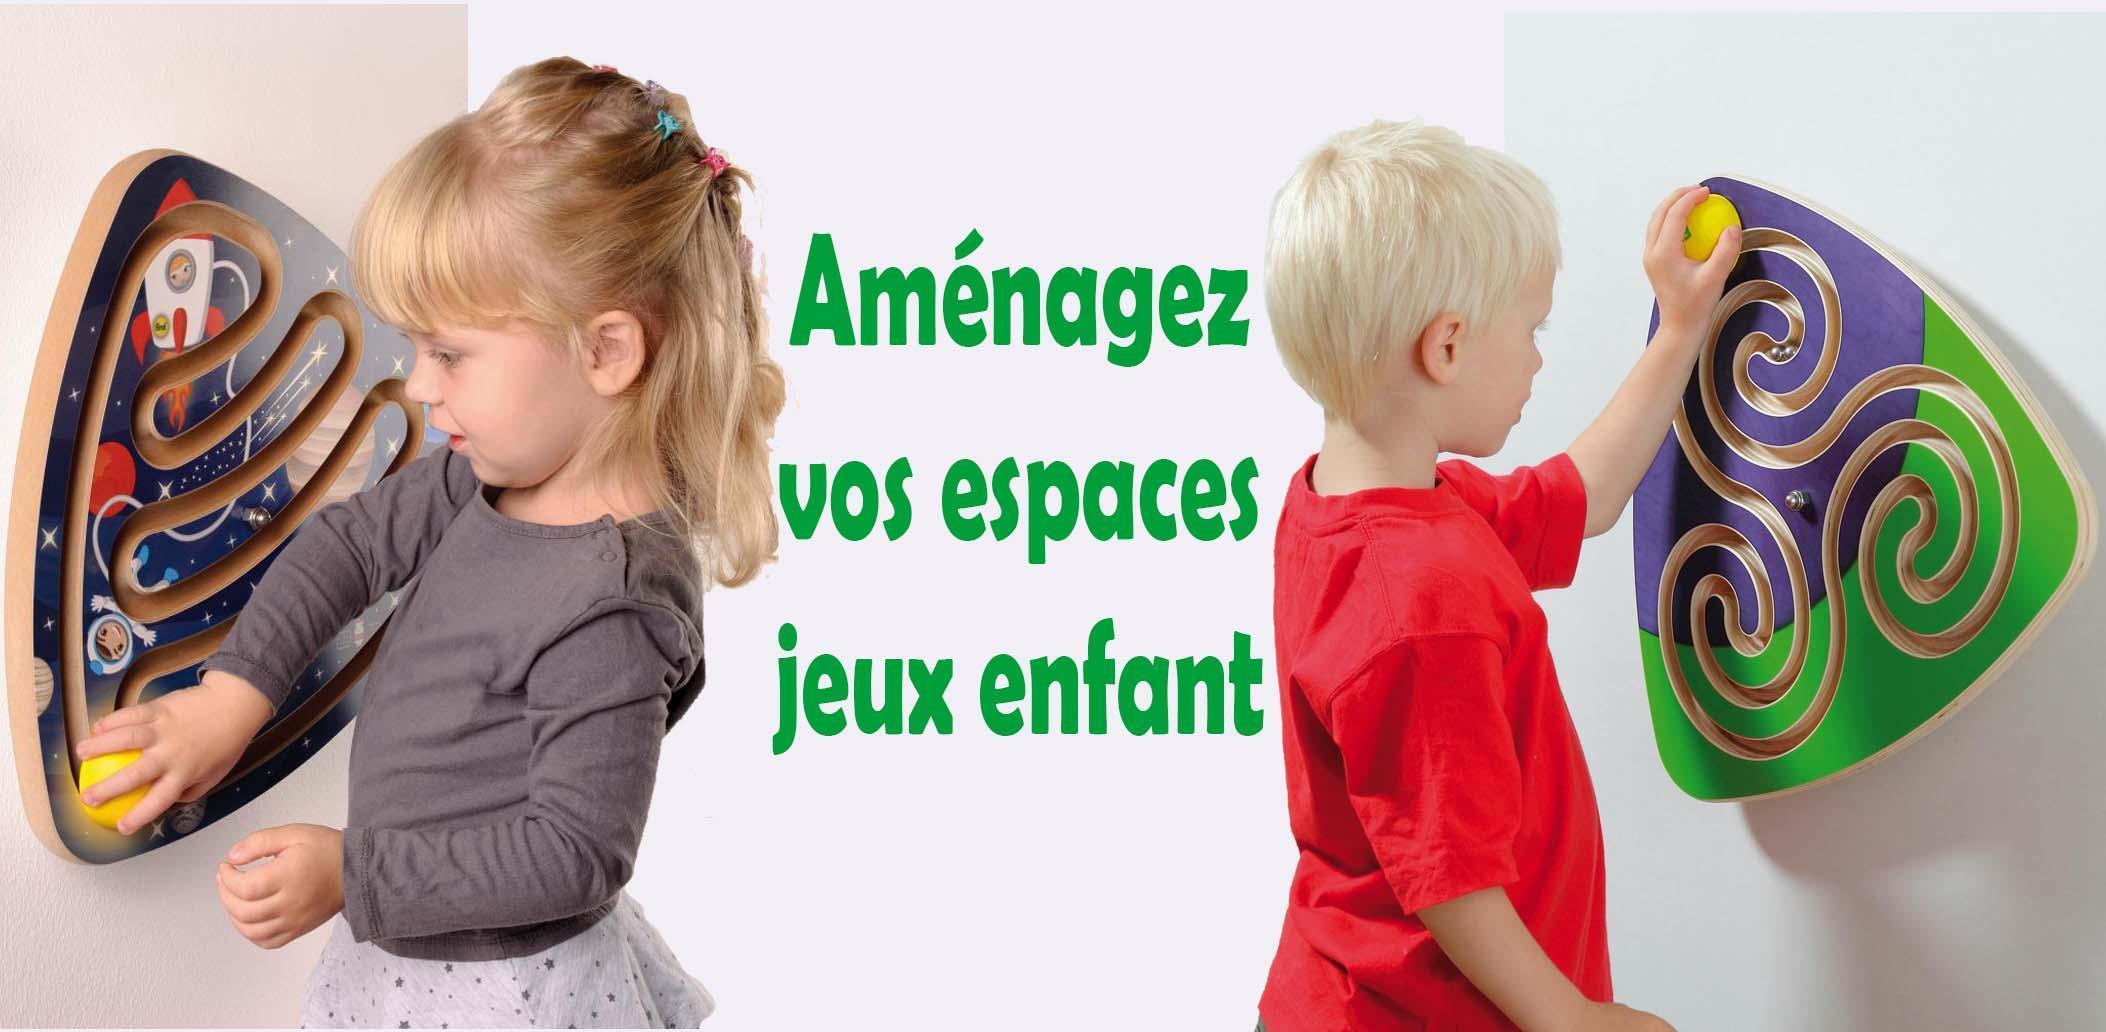 Amenagez-espace-enfant2.jpg